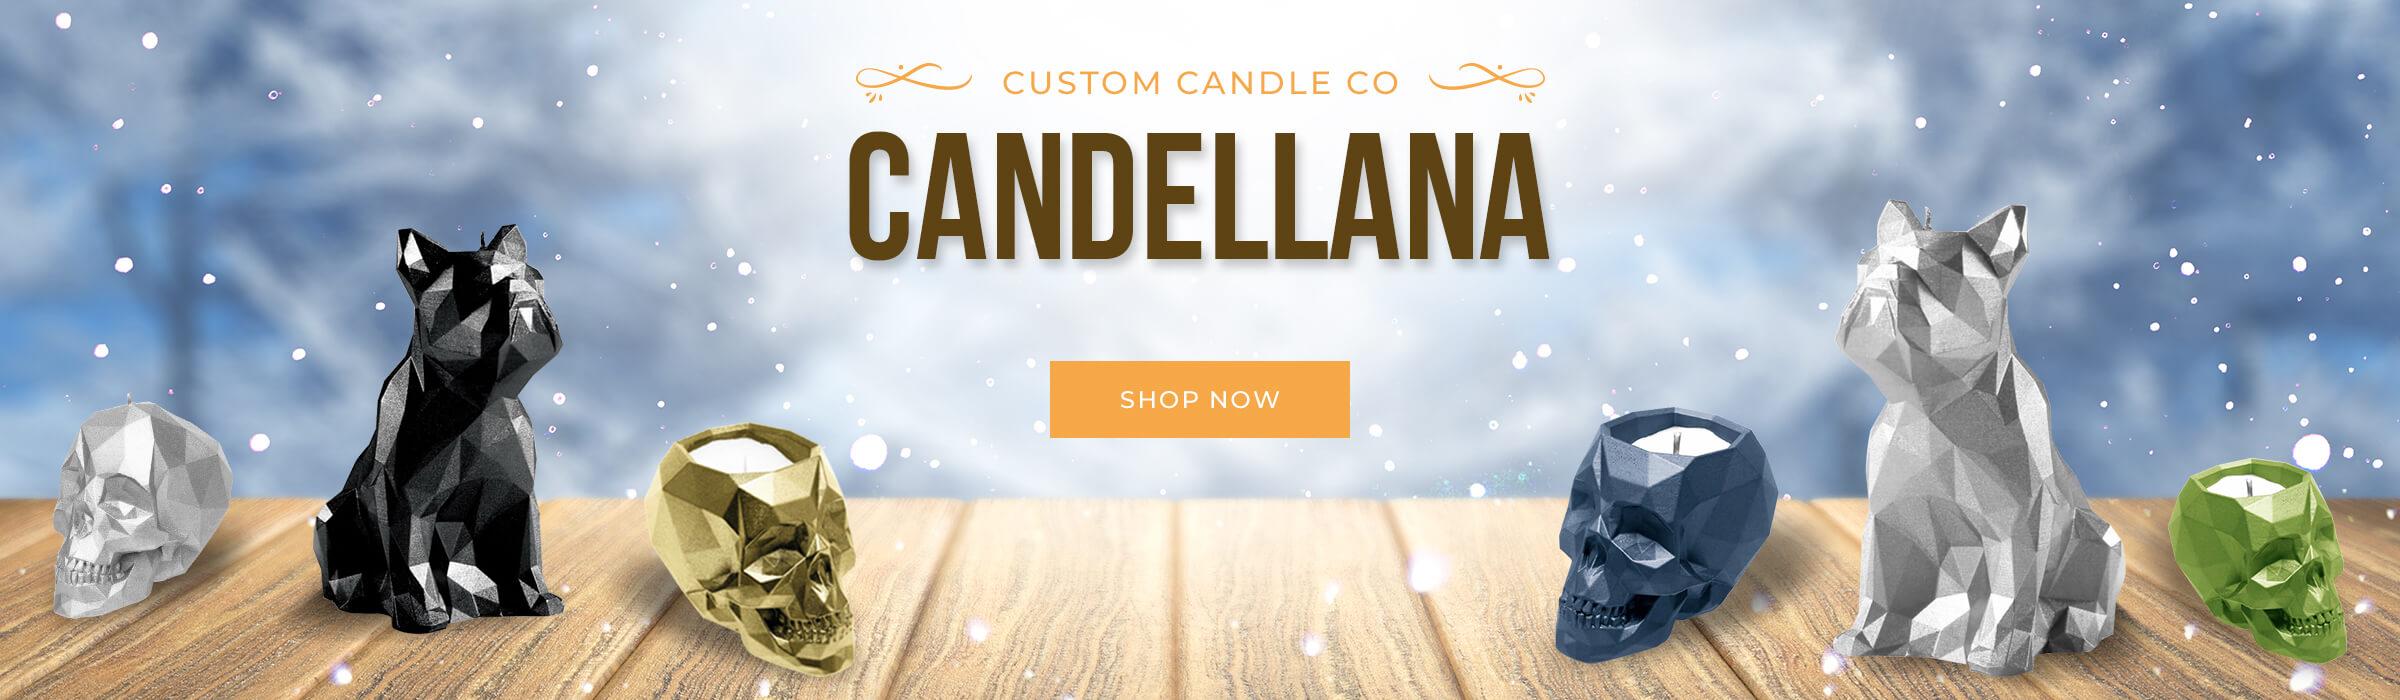 Candellana